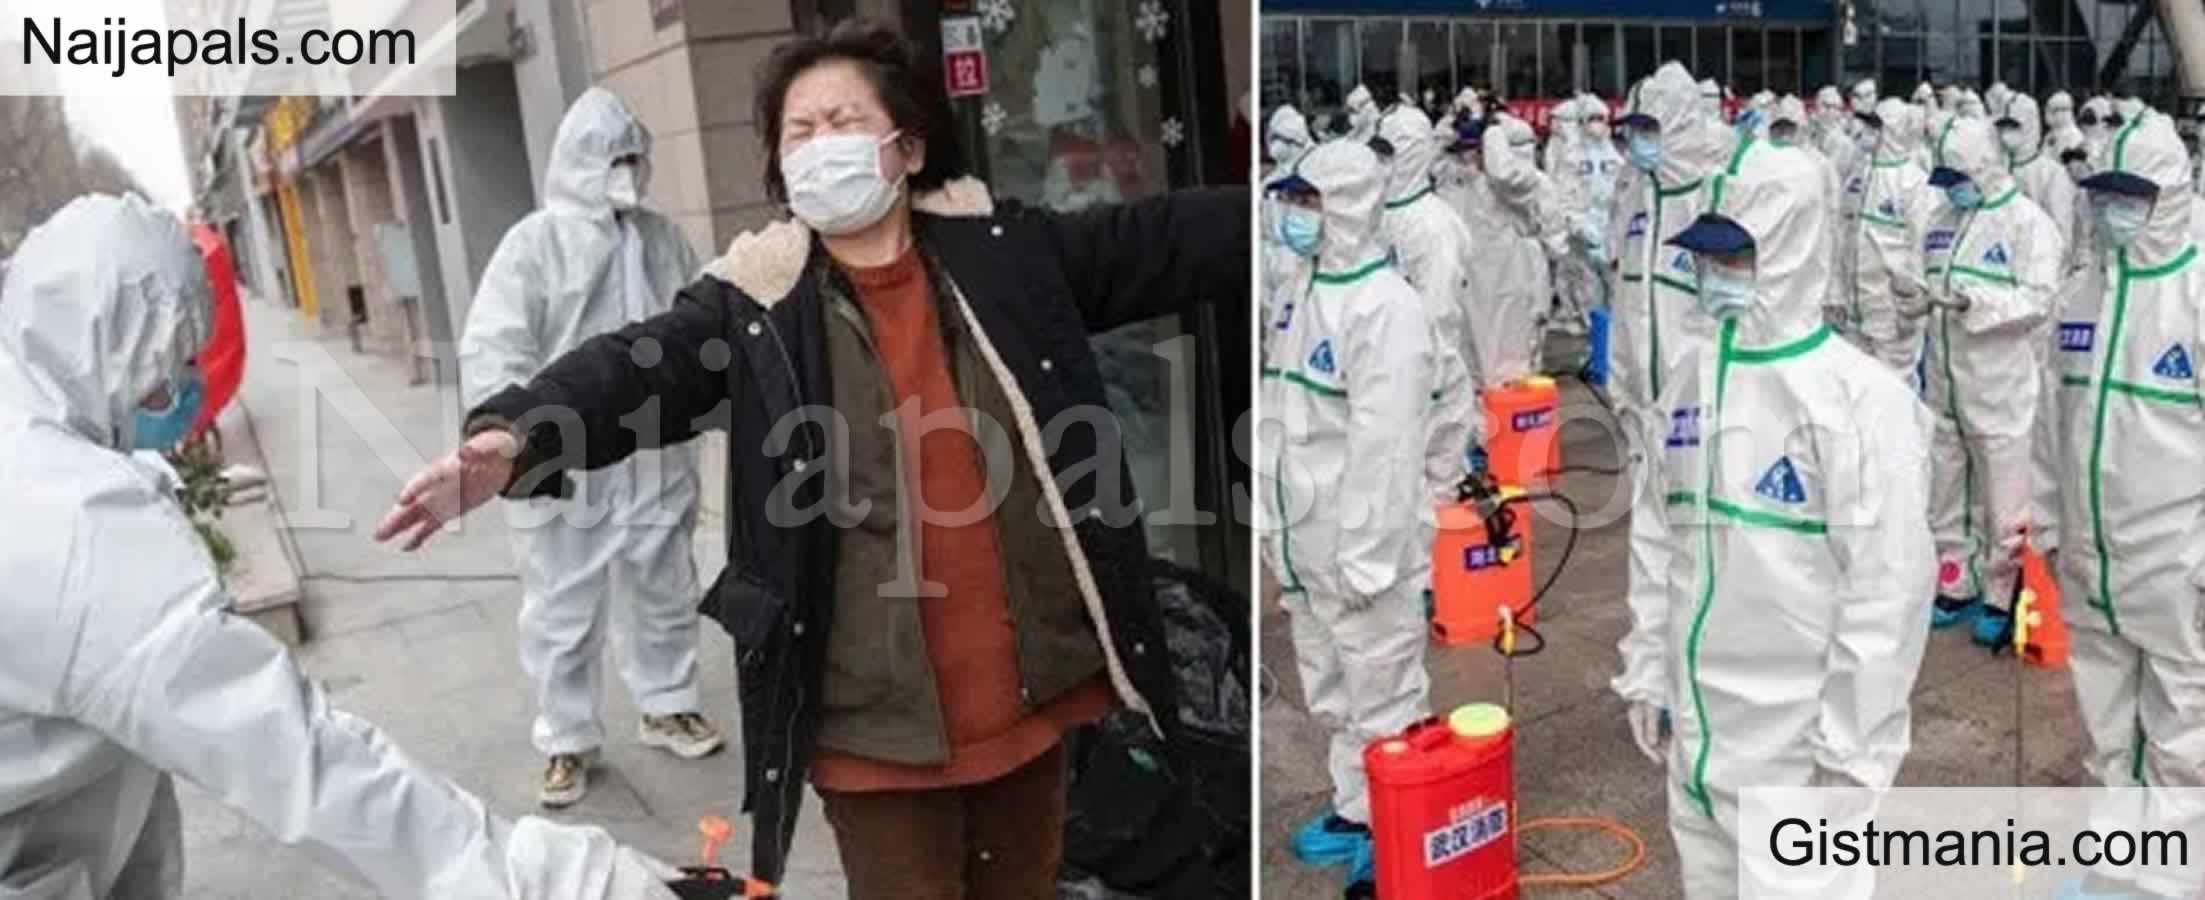 <img alt='.' class='lazyload' data-src='https://img.gistmania.com/emot/news.gif' /> <b>An Unknown Pneumonia Deadlier Than Coronavirus Is Spreading in Kazakhstan</b> - China Reveals